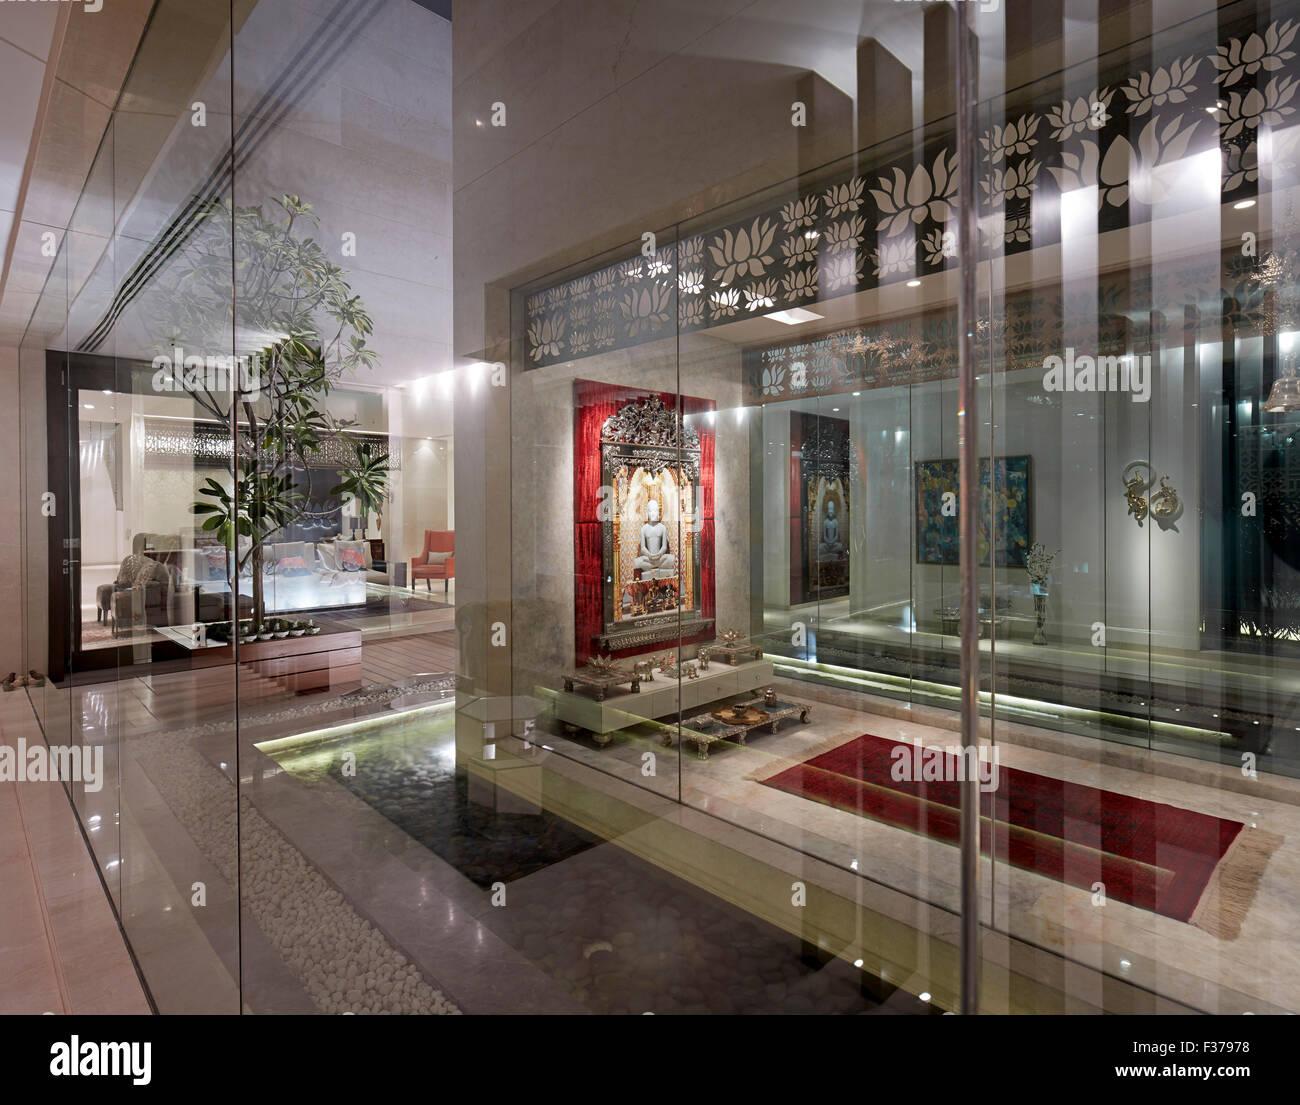 N85 Residence In New Delhi India: Interior View In Shrine Area. House 4, New Delhi, Delhi